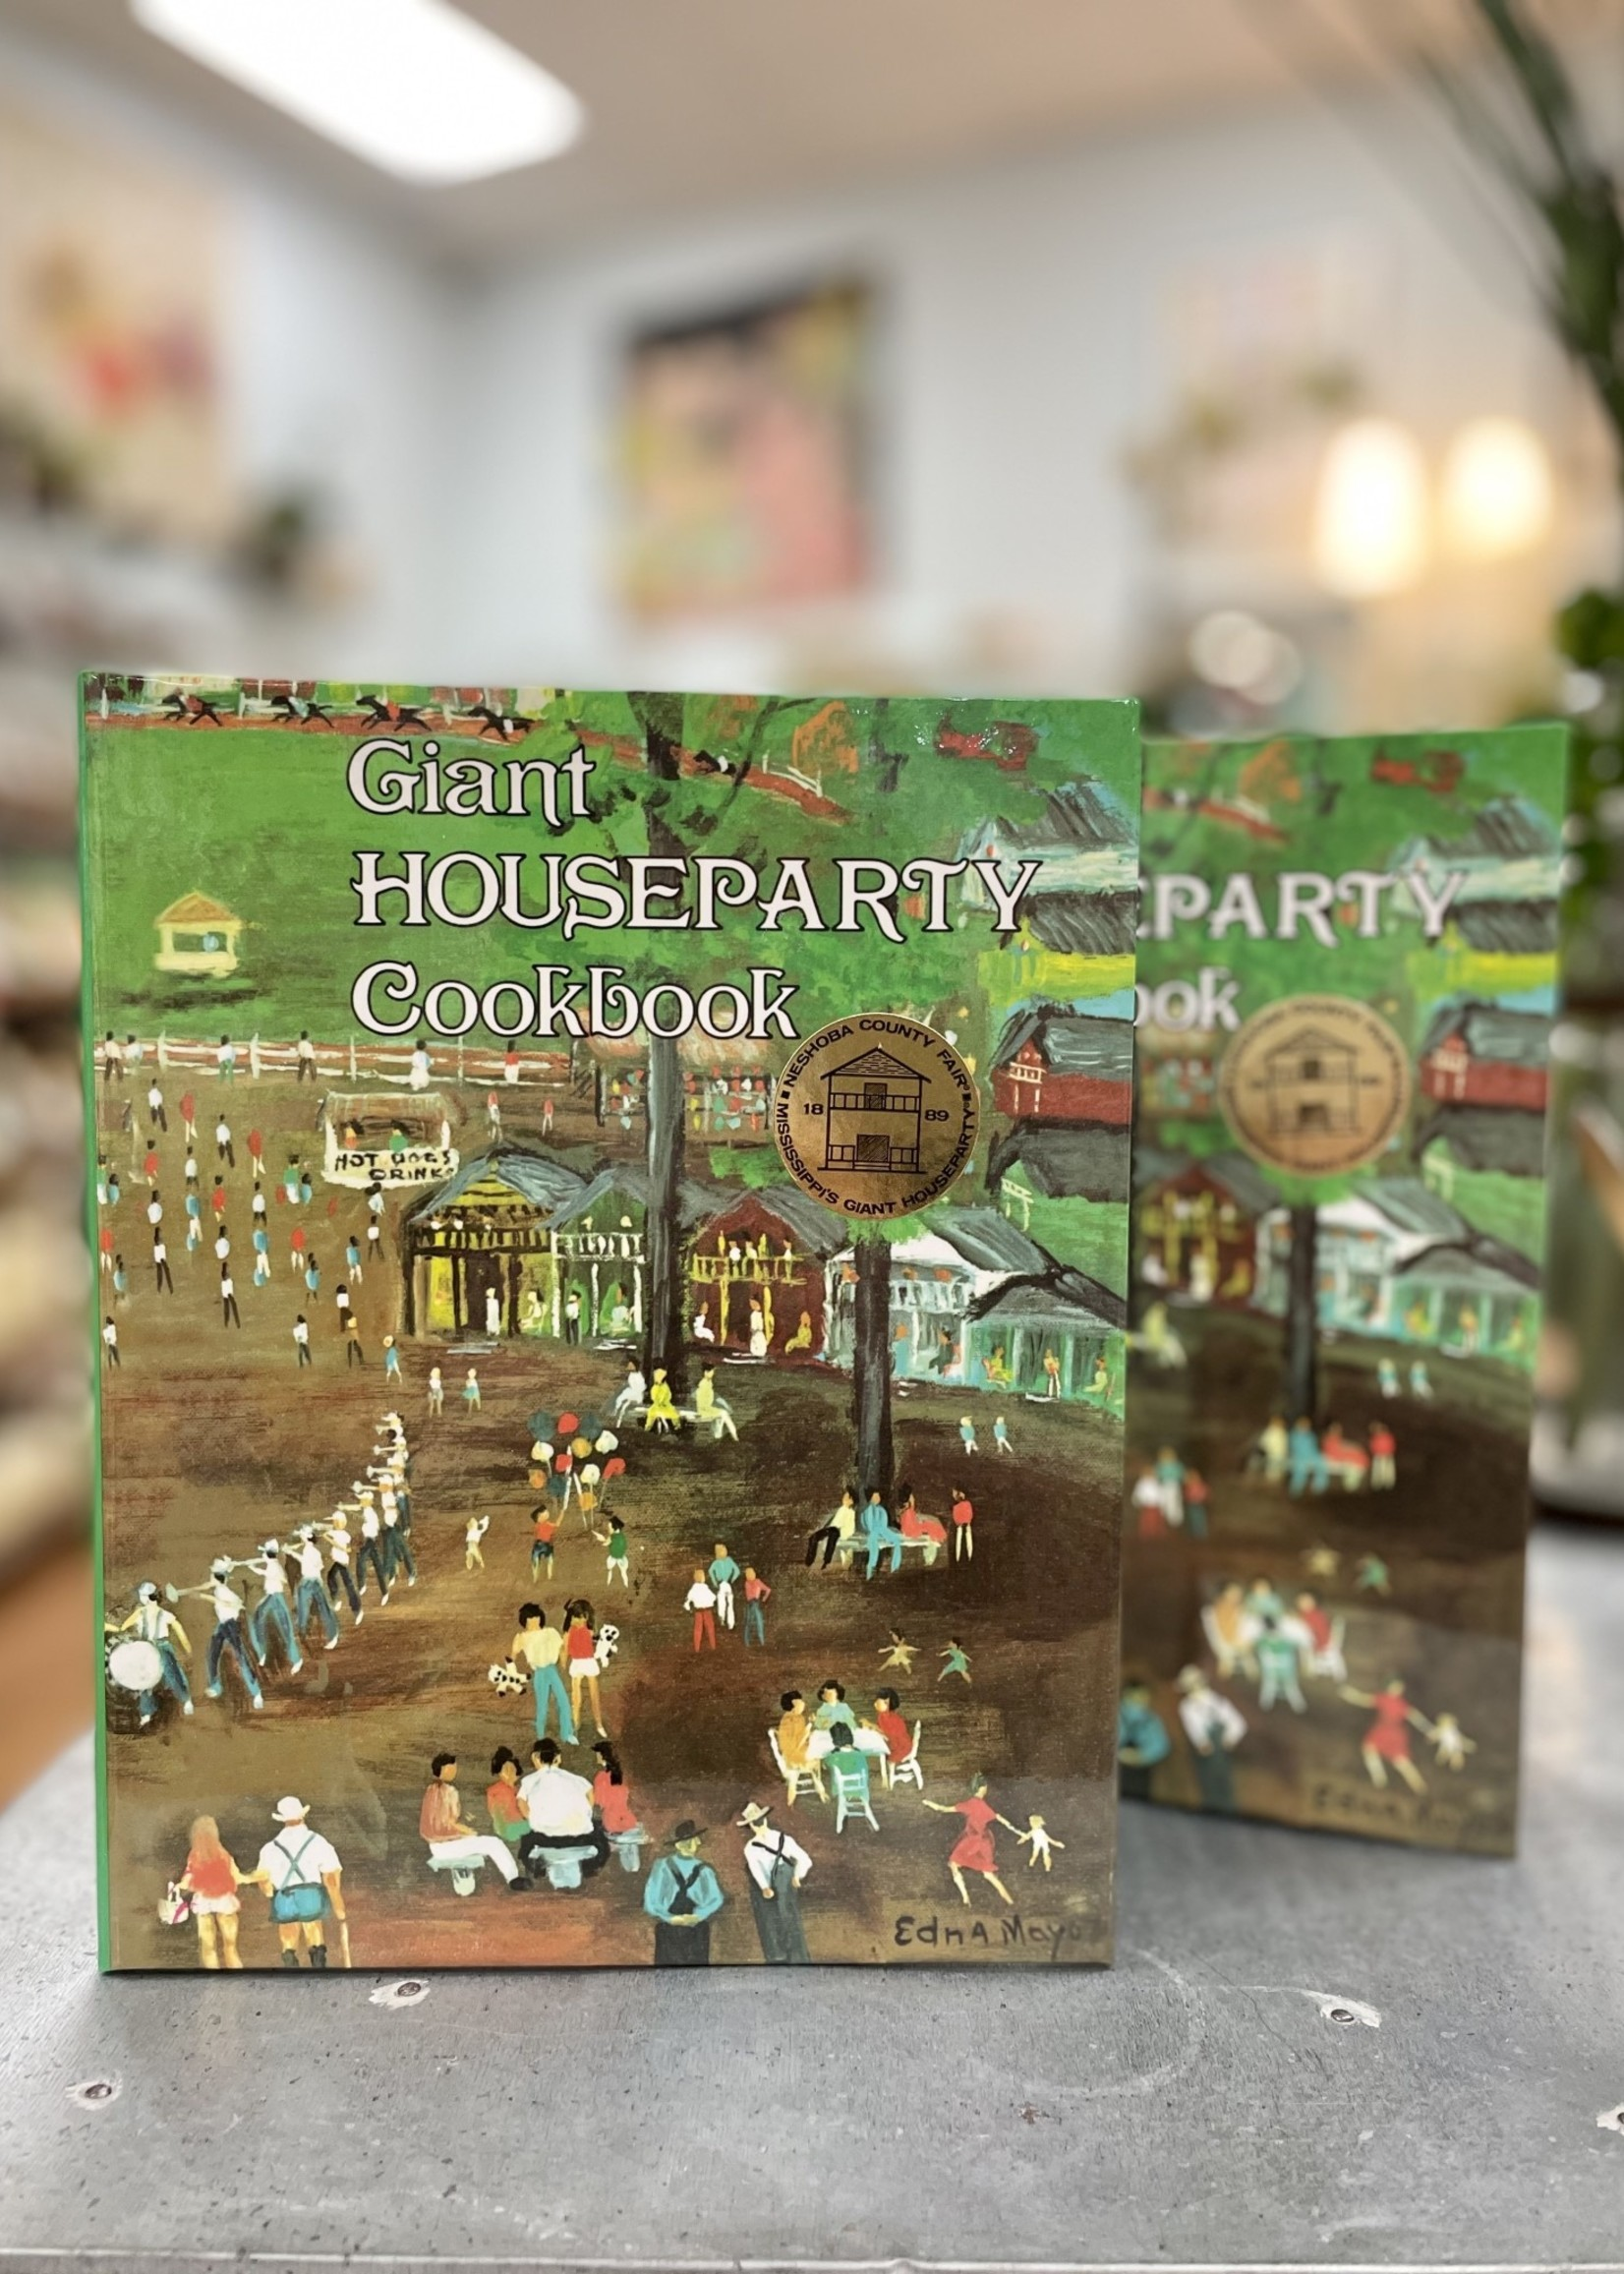 Giant Houseparty Fair Cookbook